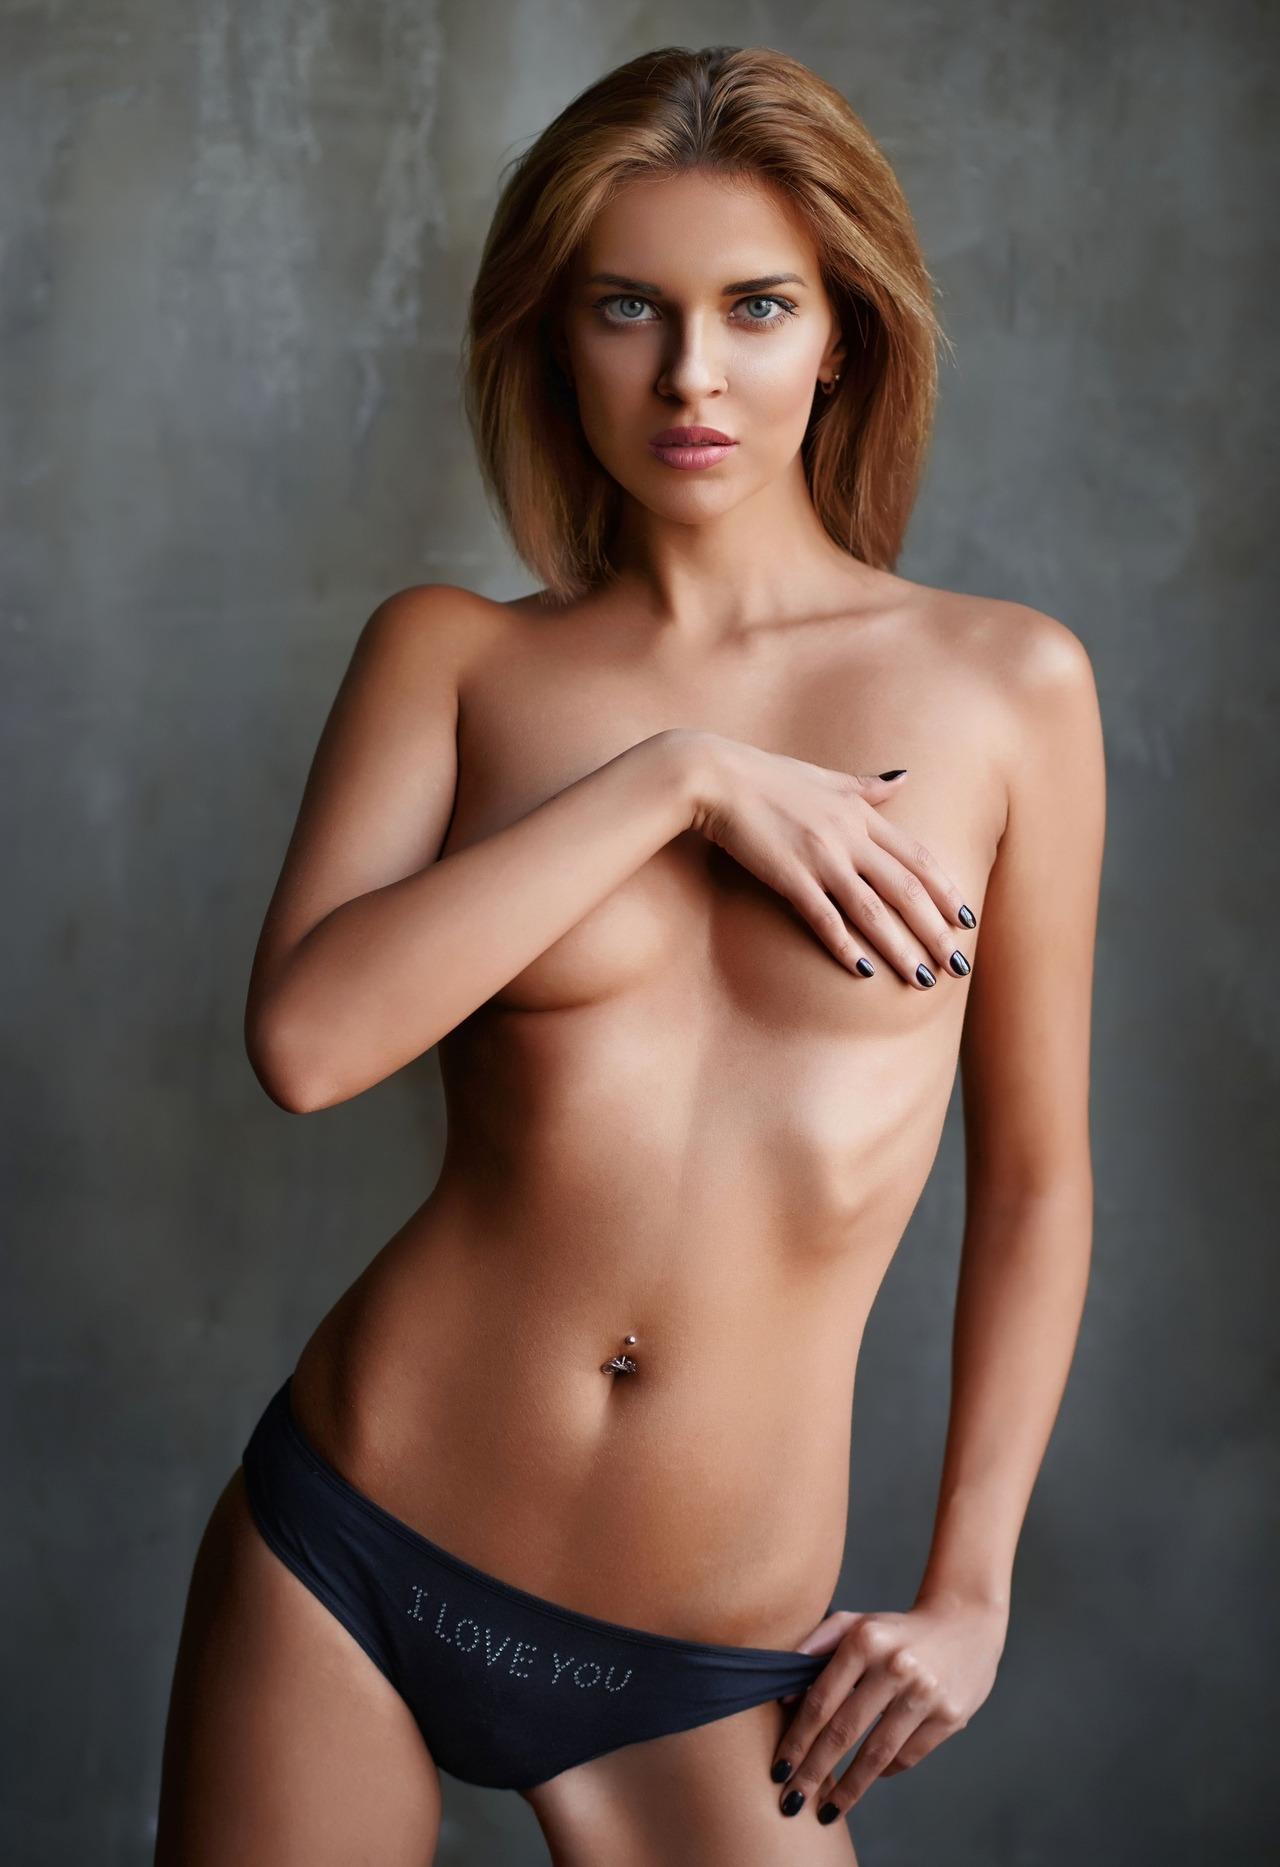 Victoria Kl